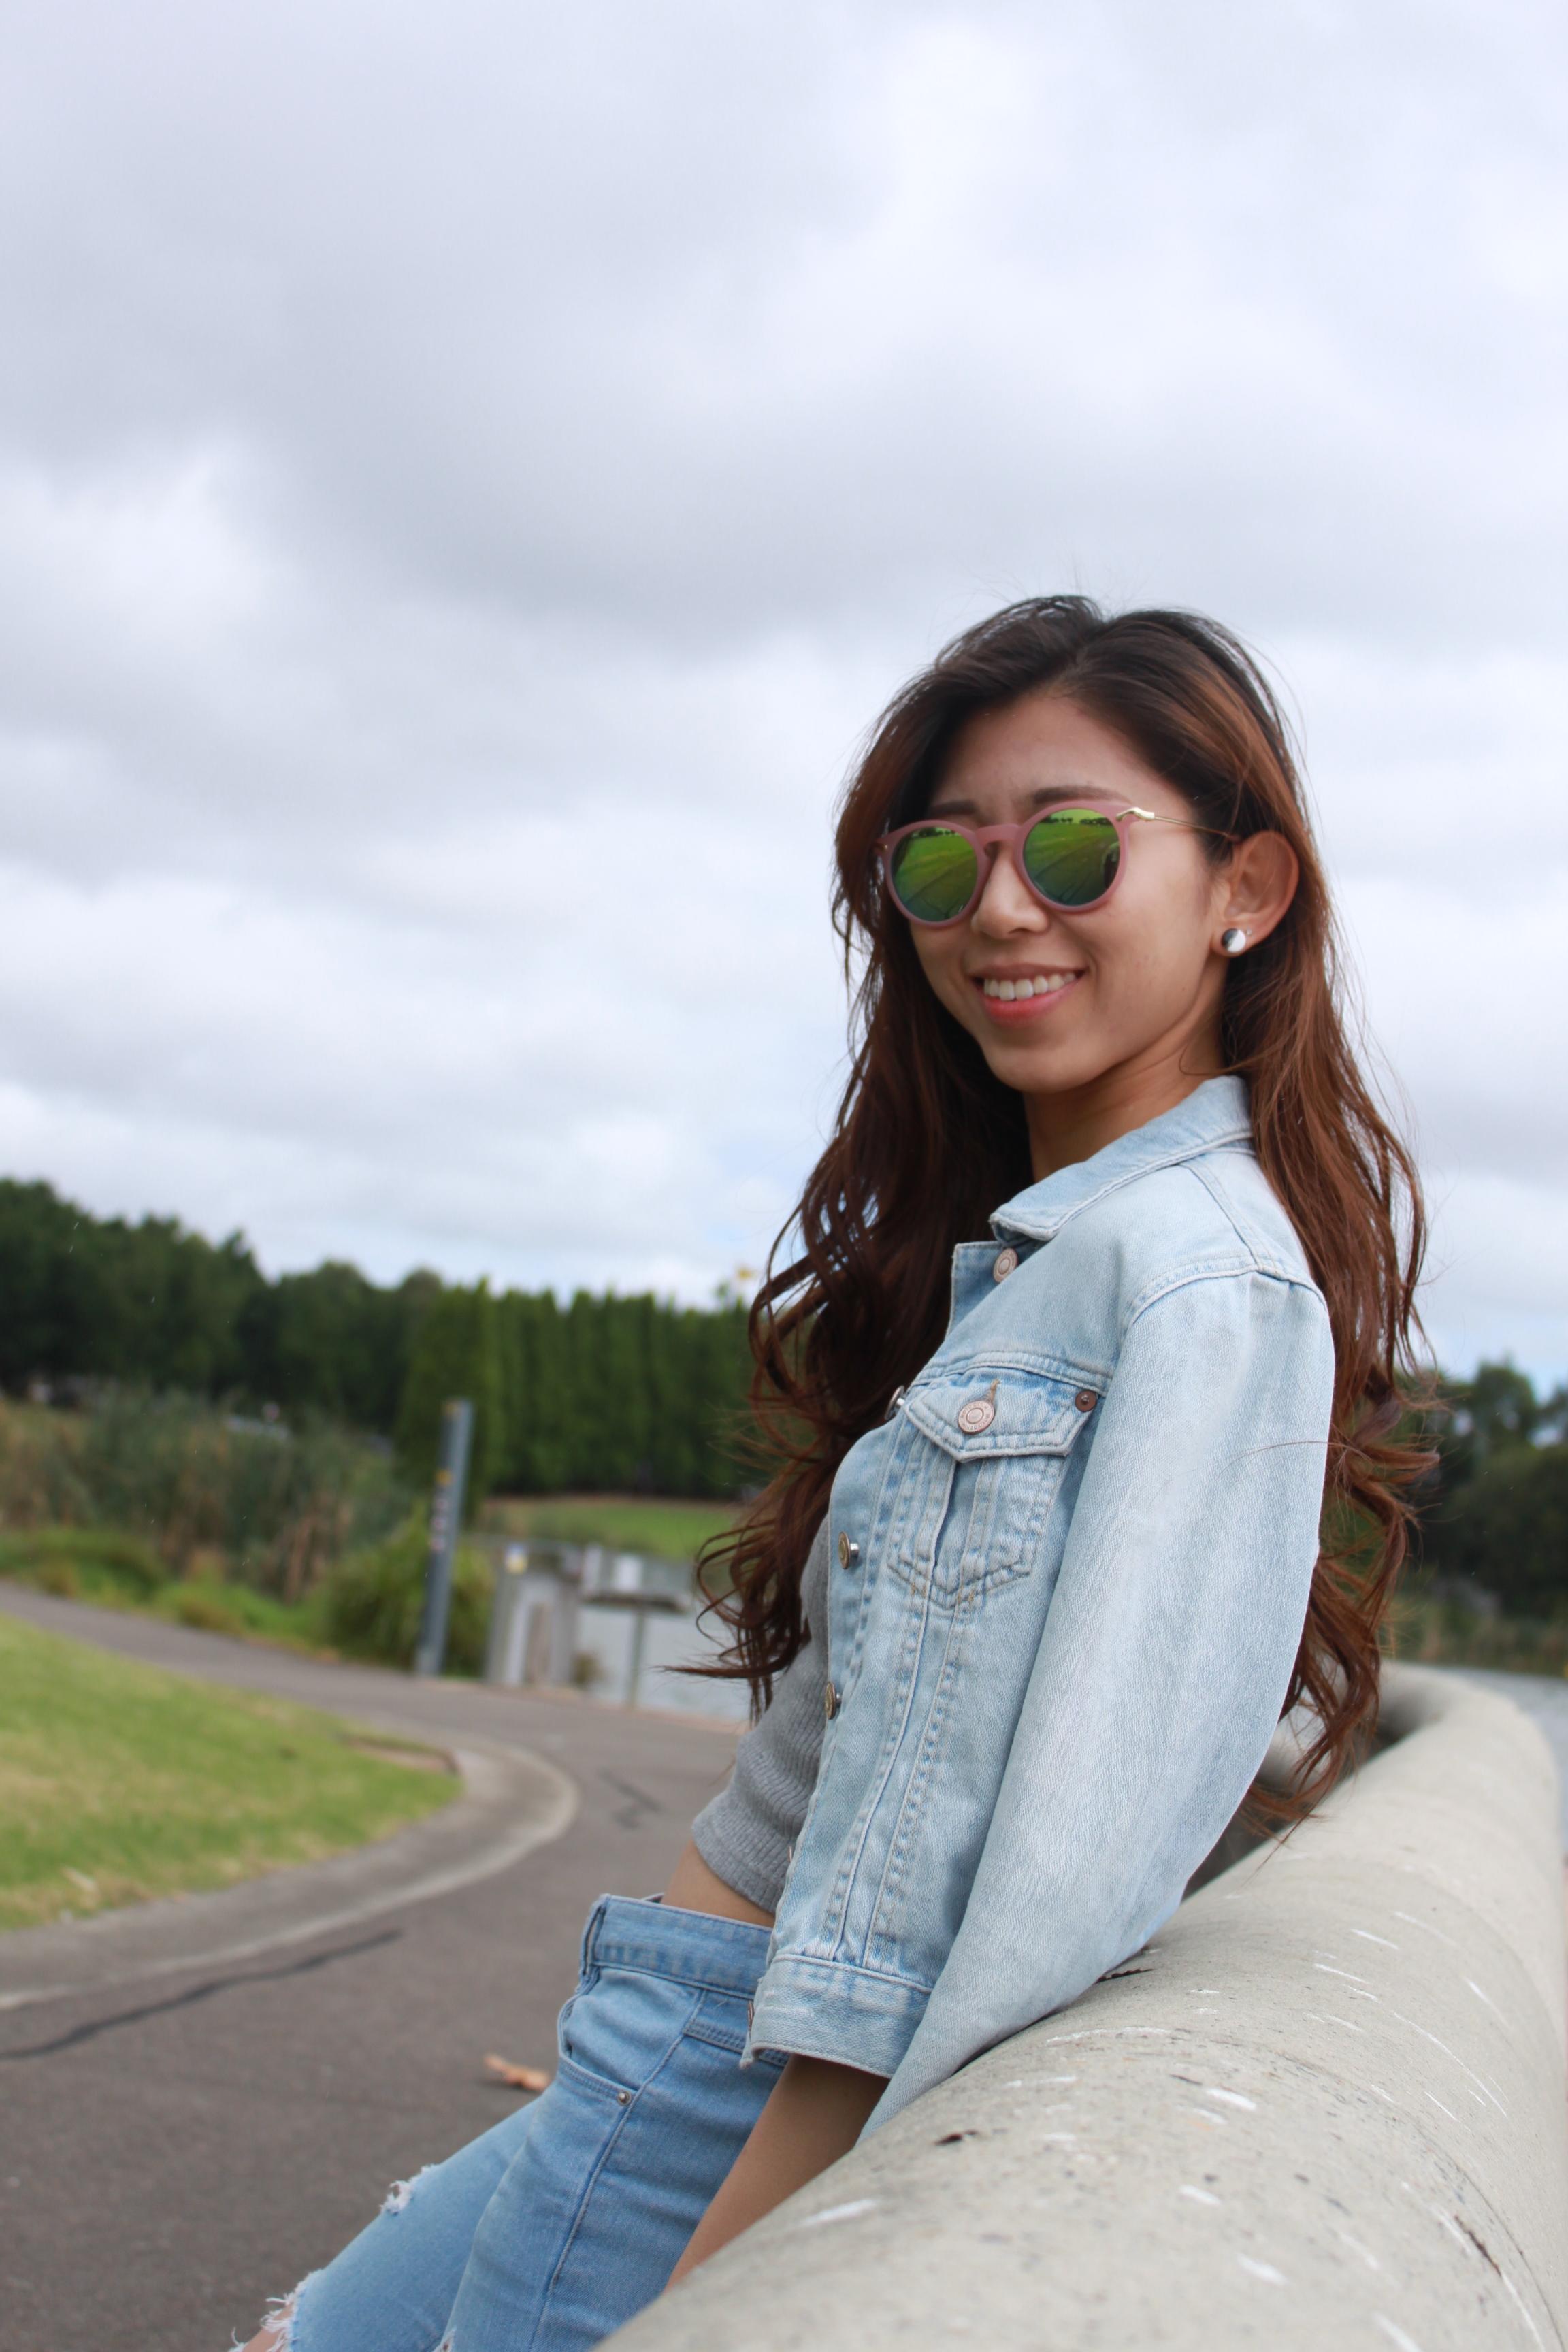 Topshop grey top / Korea ripped jeans / Topshop denim jacket / Vans white slip on